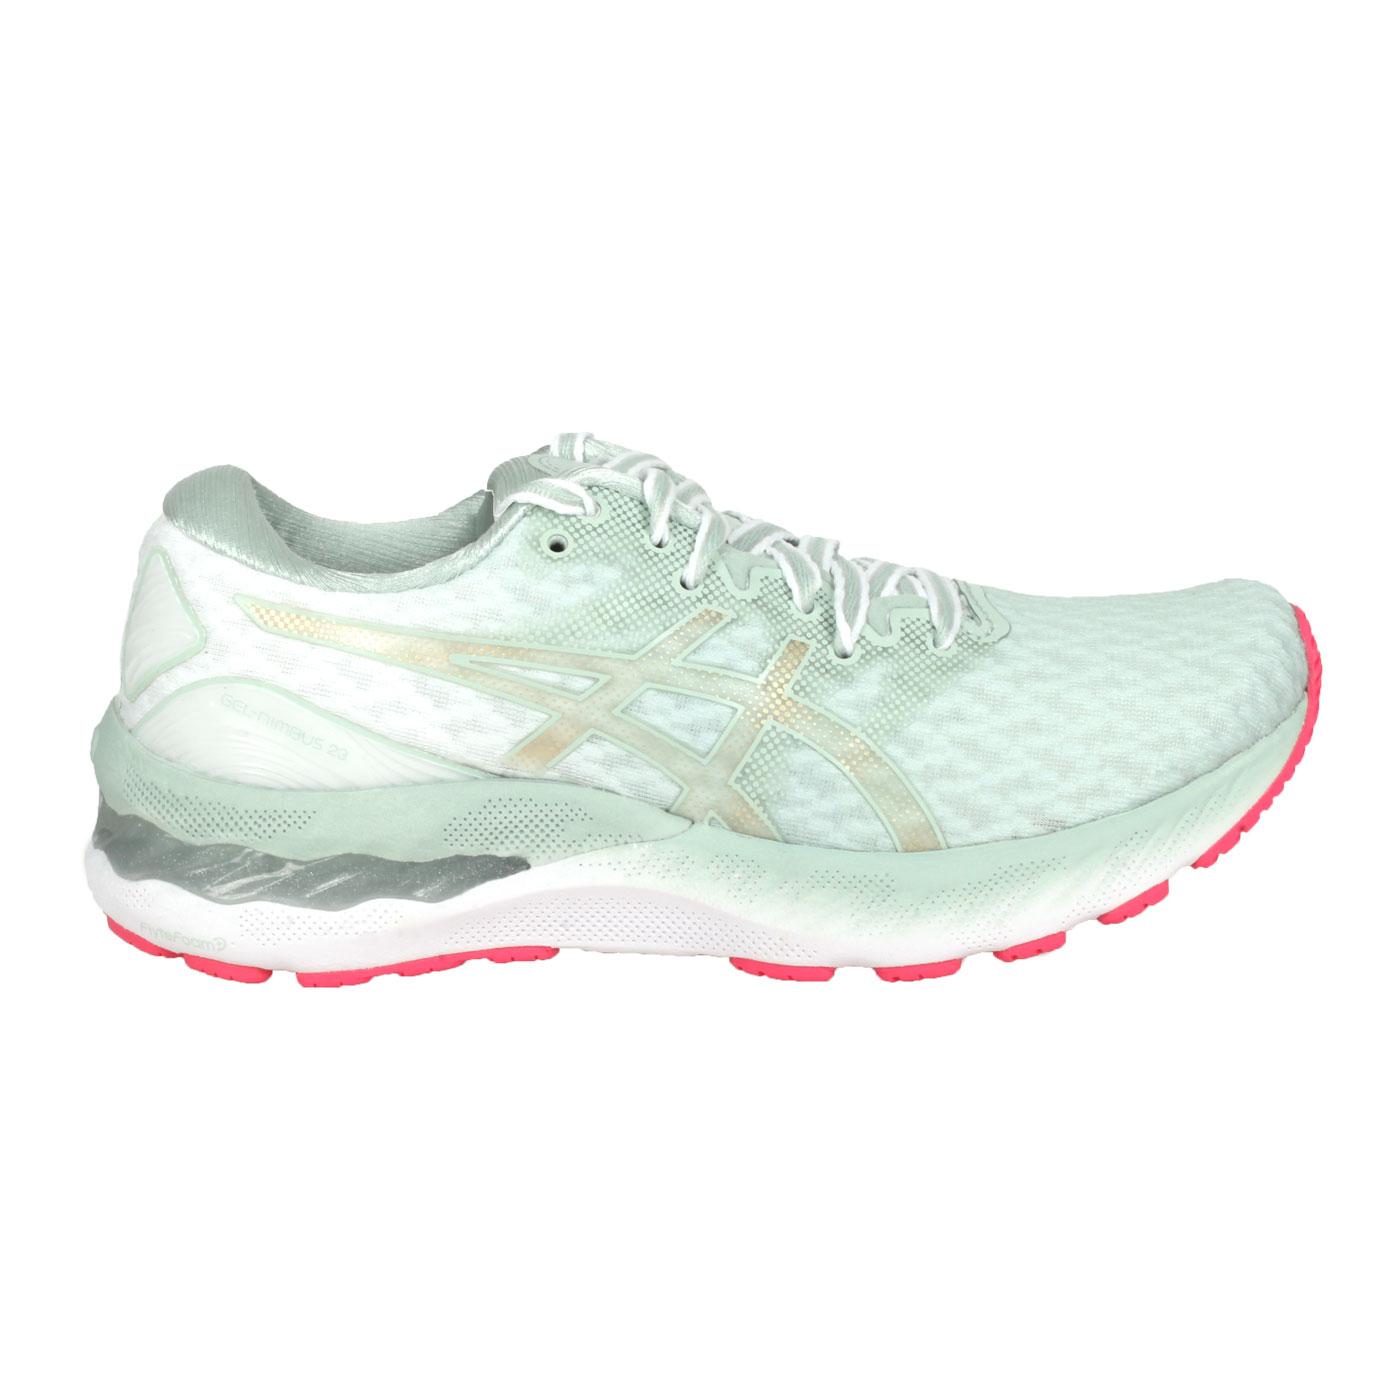 ASICS 女款慢跑鞋  @GEL-NIMBUS 23@1012A999-300